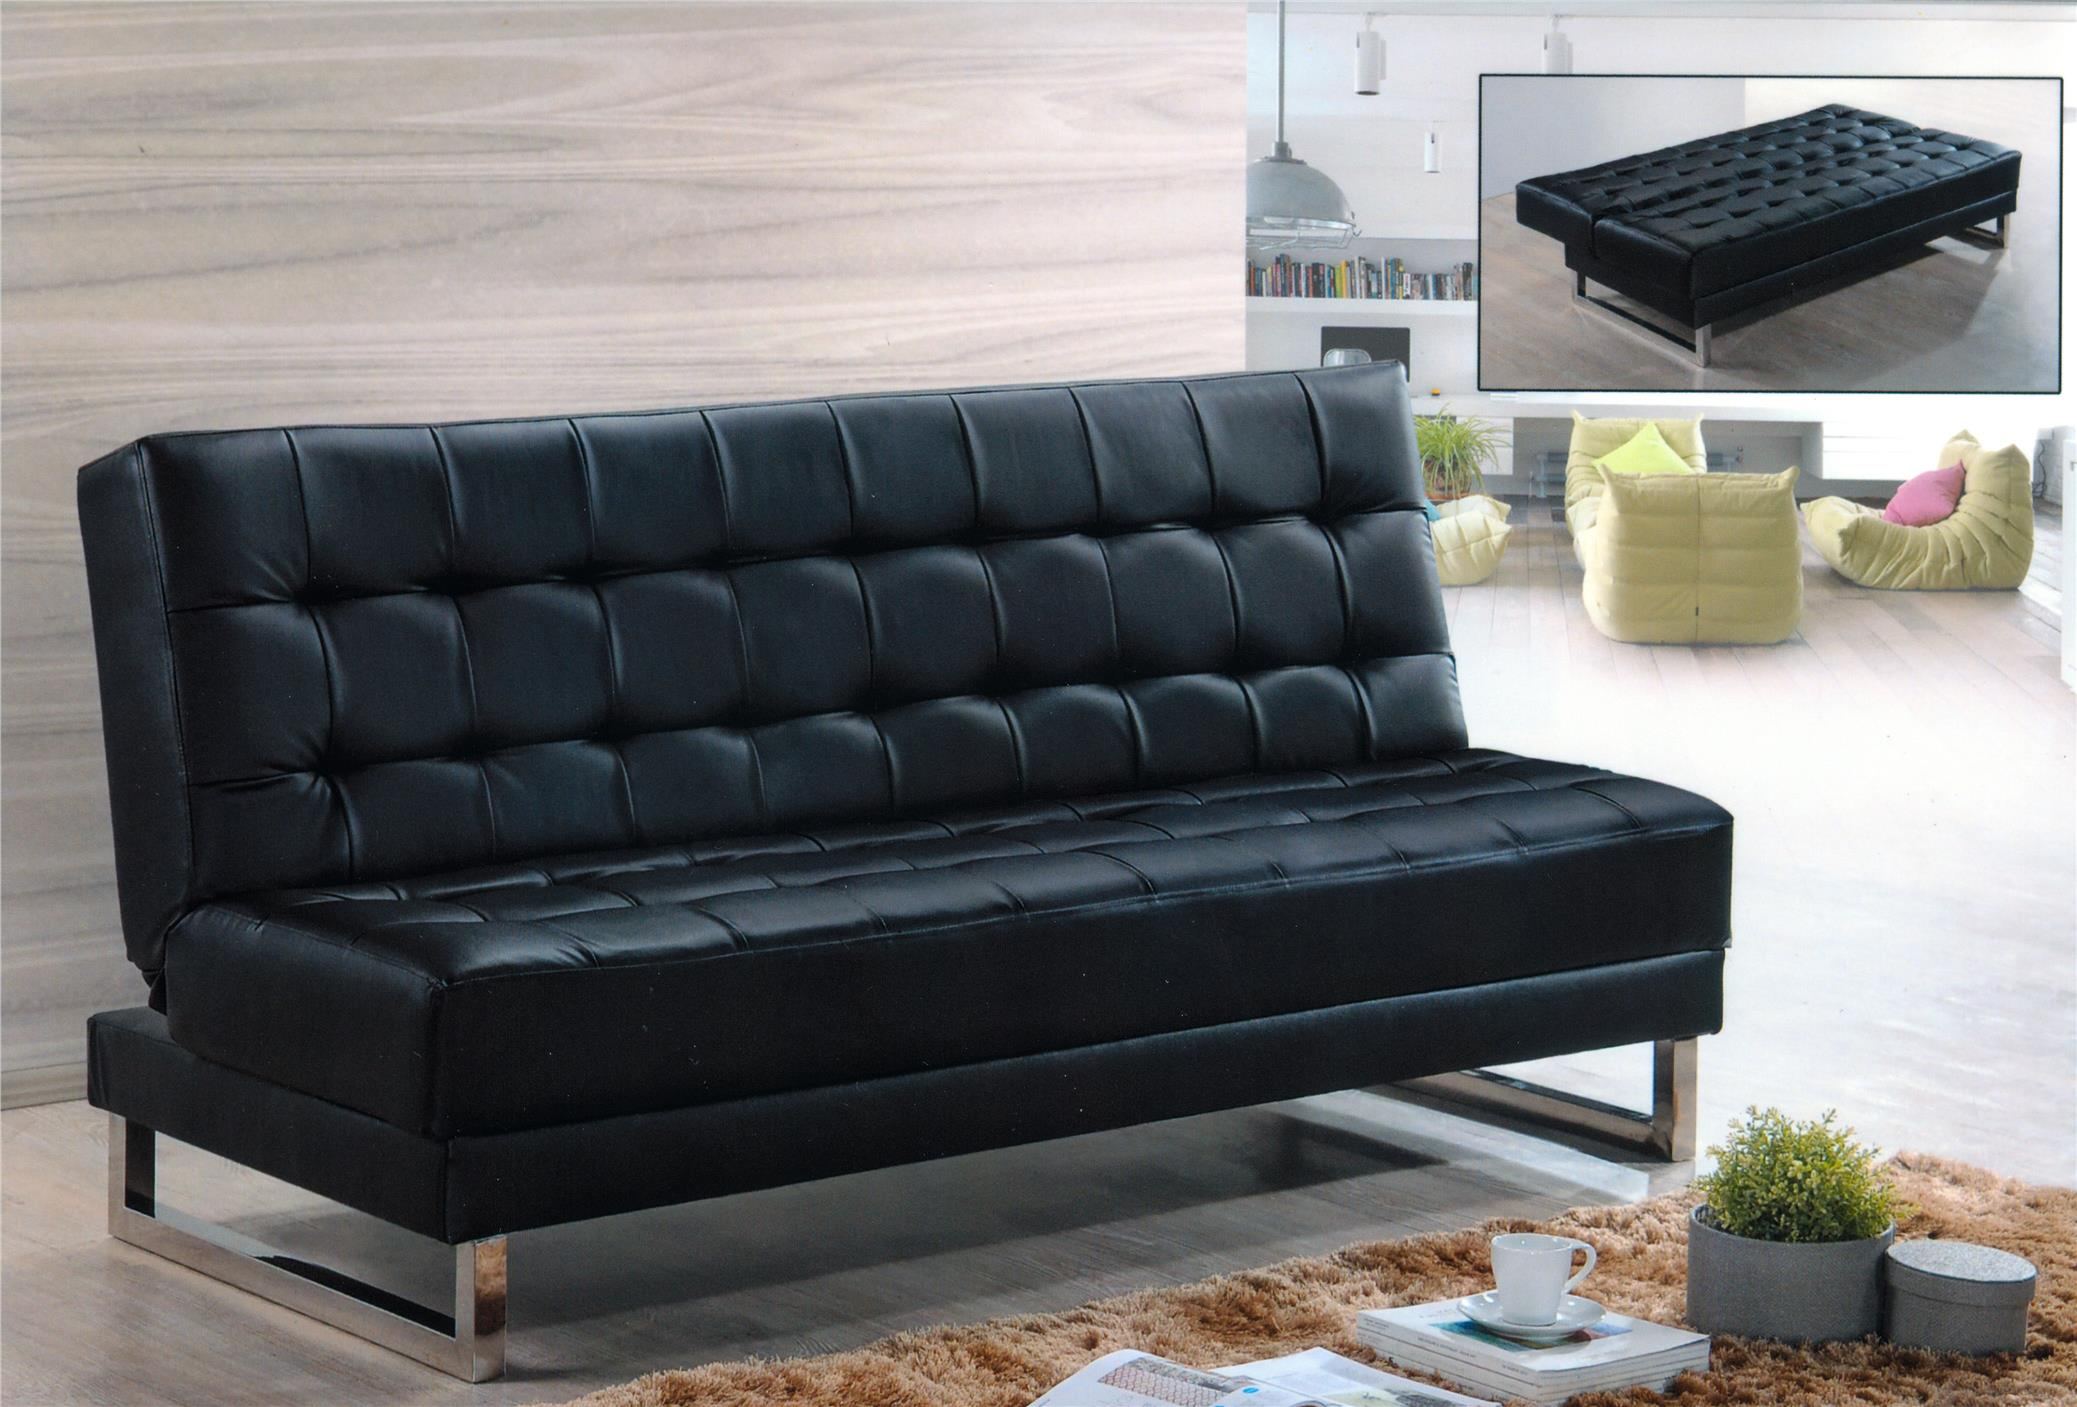 sabrina sofa mini sectional i home 889 bed end 12 10 2017 3 15 pm